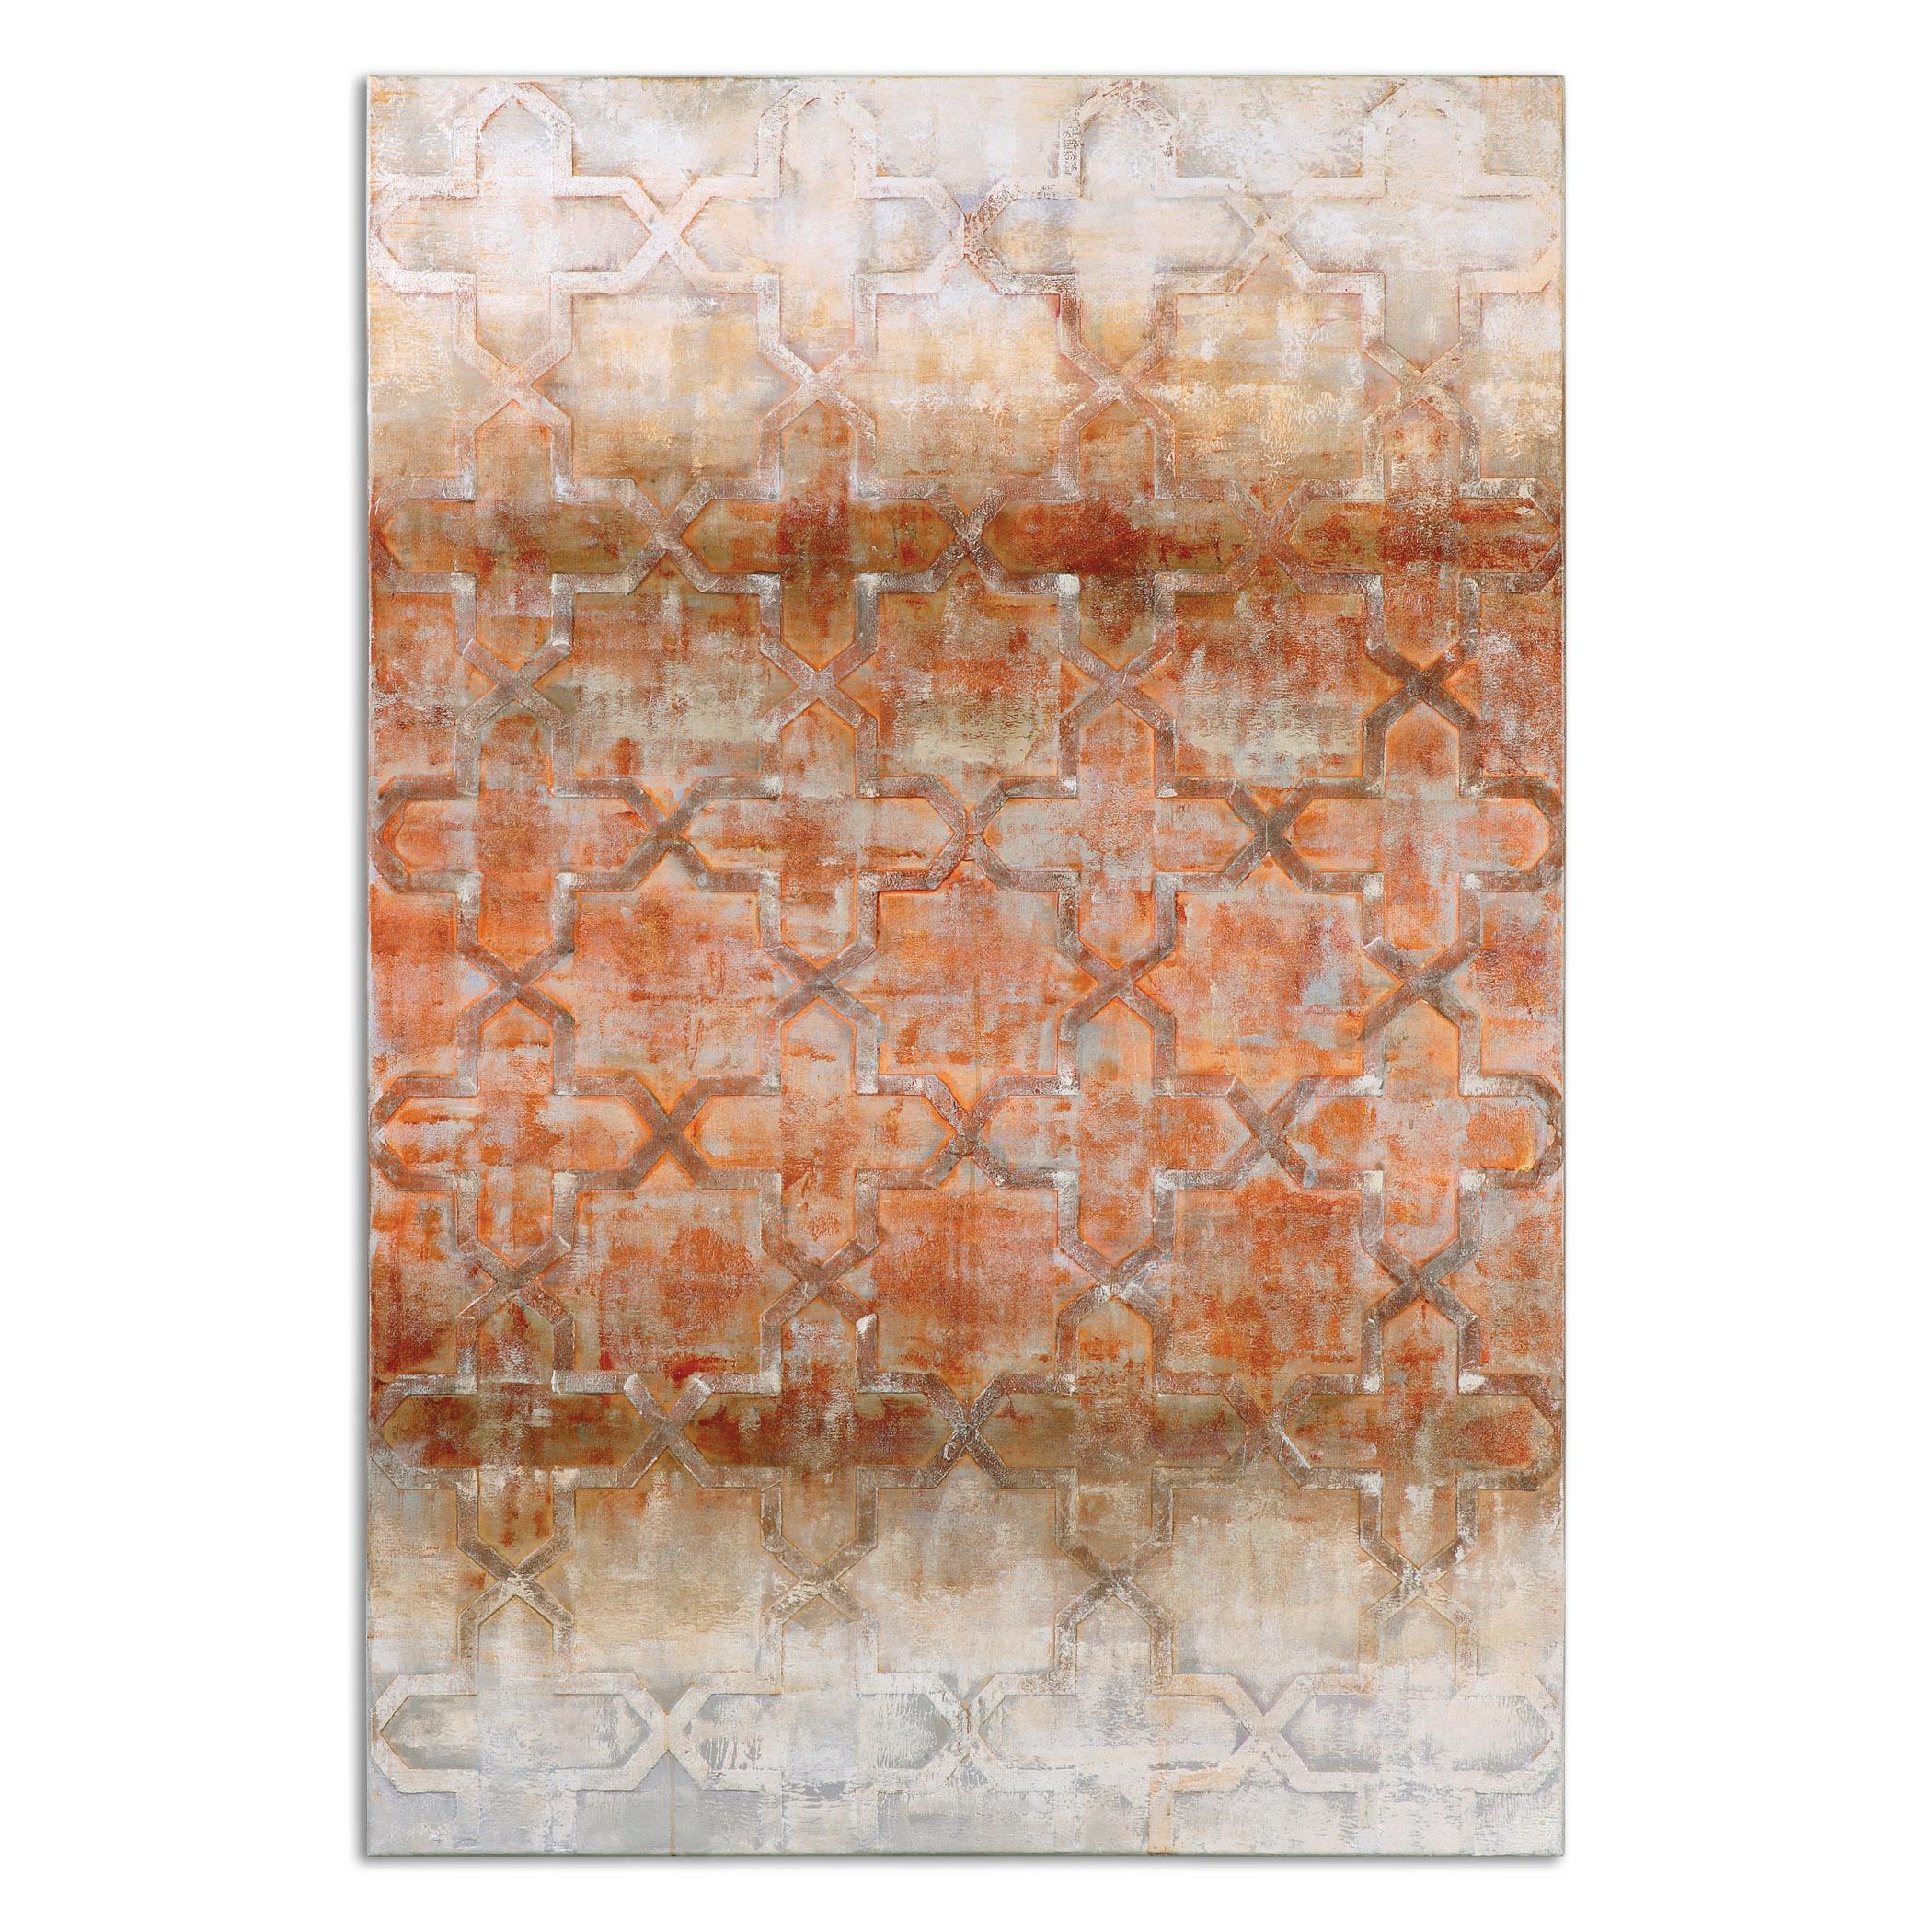 Uttermost Art Geometric Impressions Modern Art - Item Number: 35309